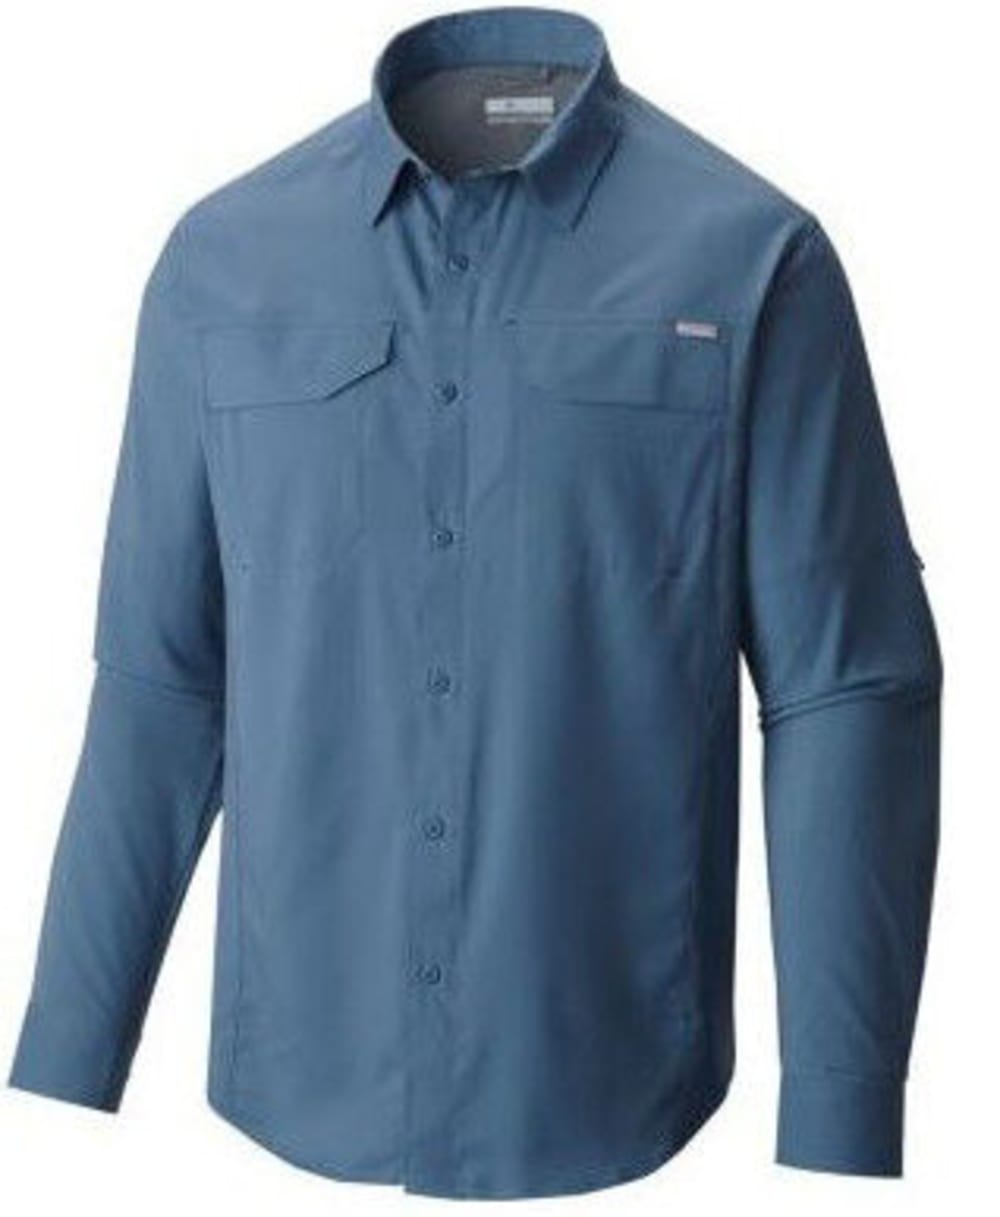 COLUMBIA Men's Silver Ridge Lite Long-Sleeve Trail Shirt - 995-PACIFIC BLUE